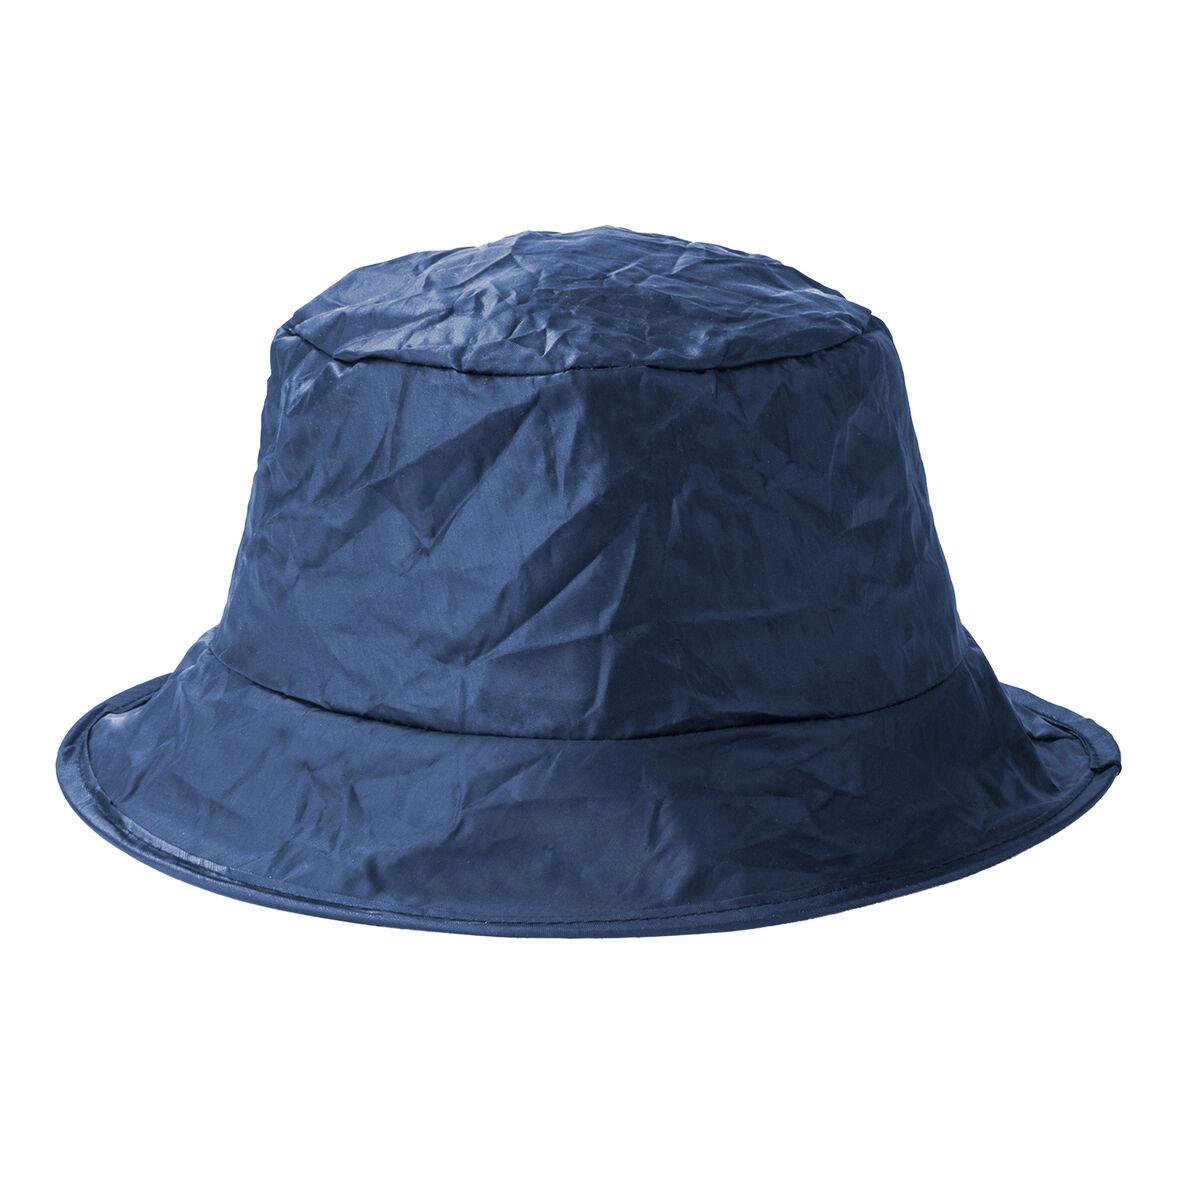 Sos Sanpei - Foldable Rain Hat, , zoo